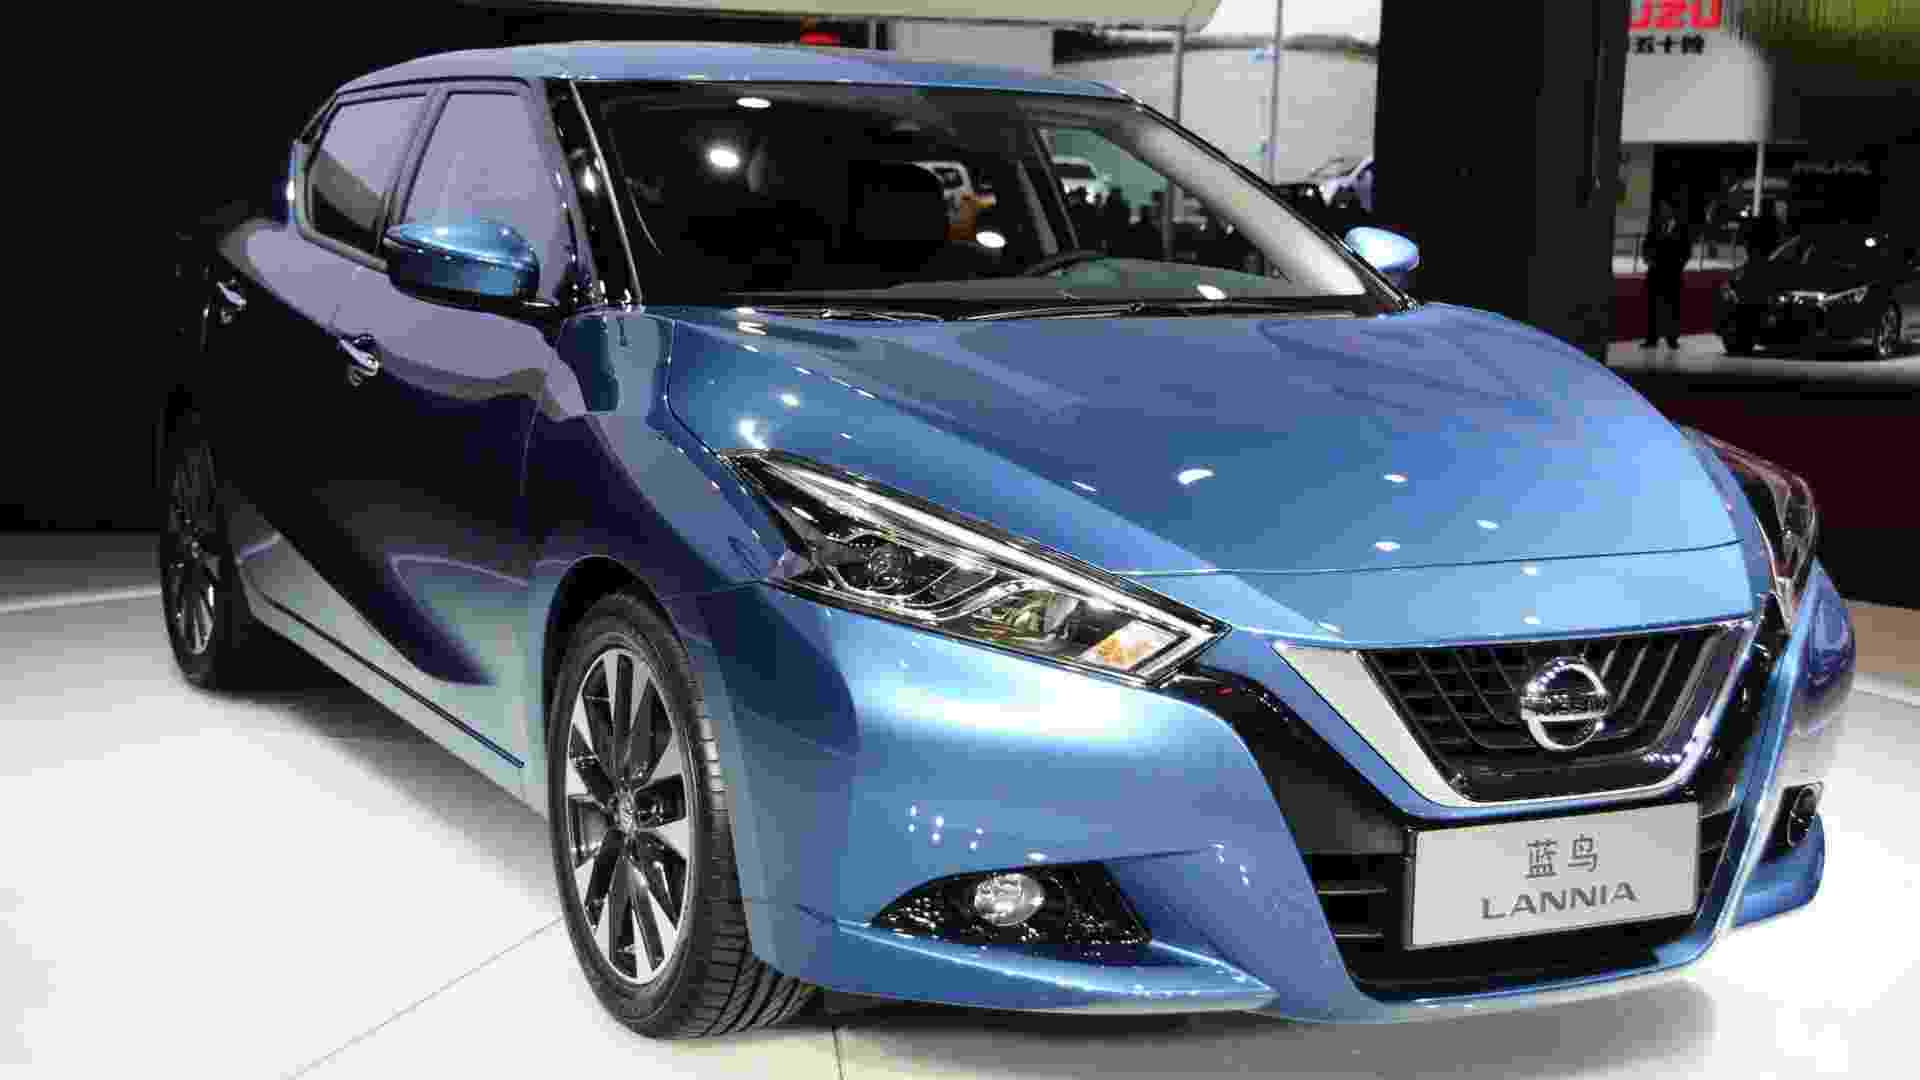 Nissan Lannia - Newspress